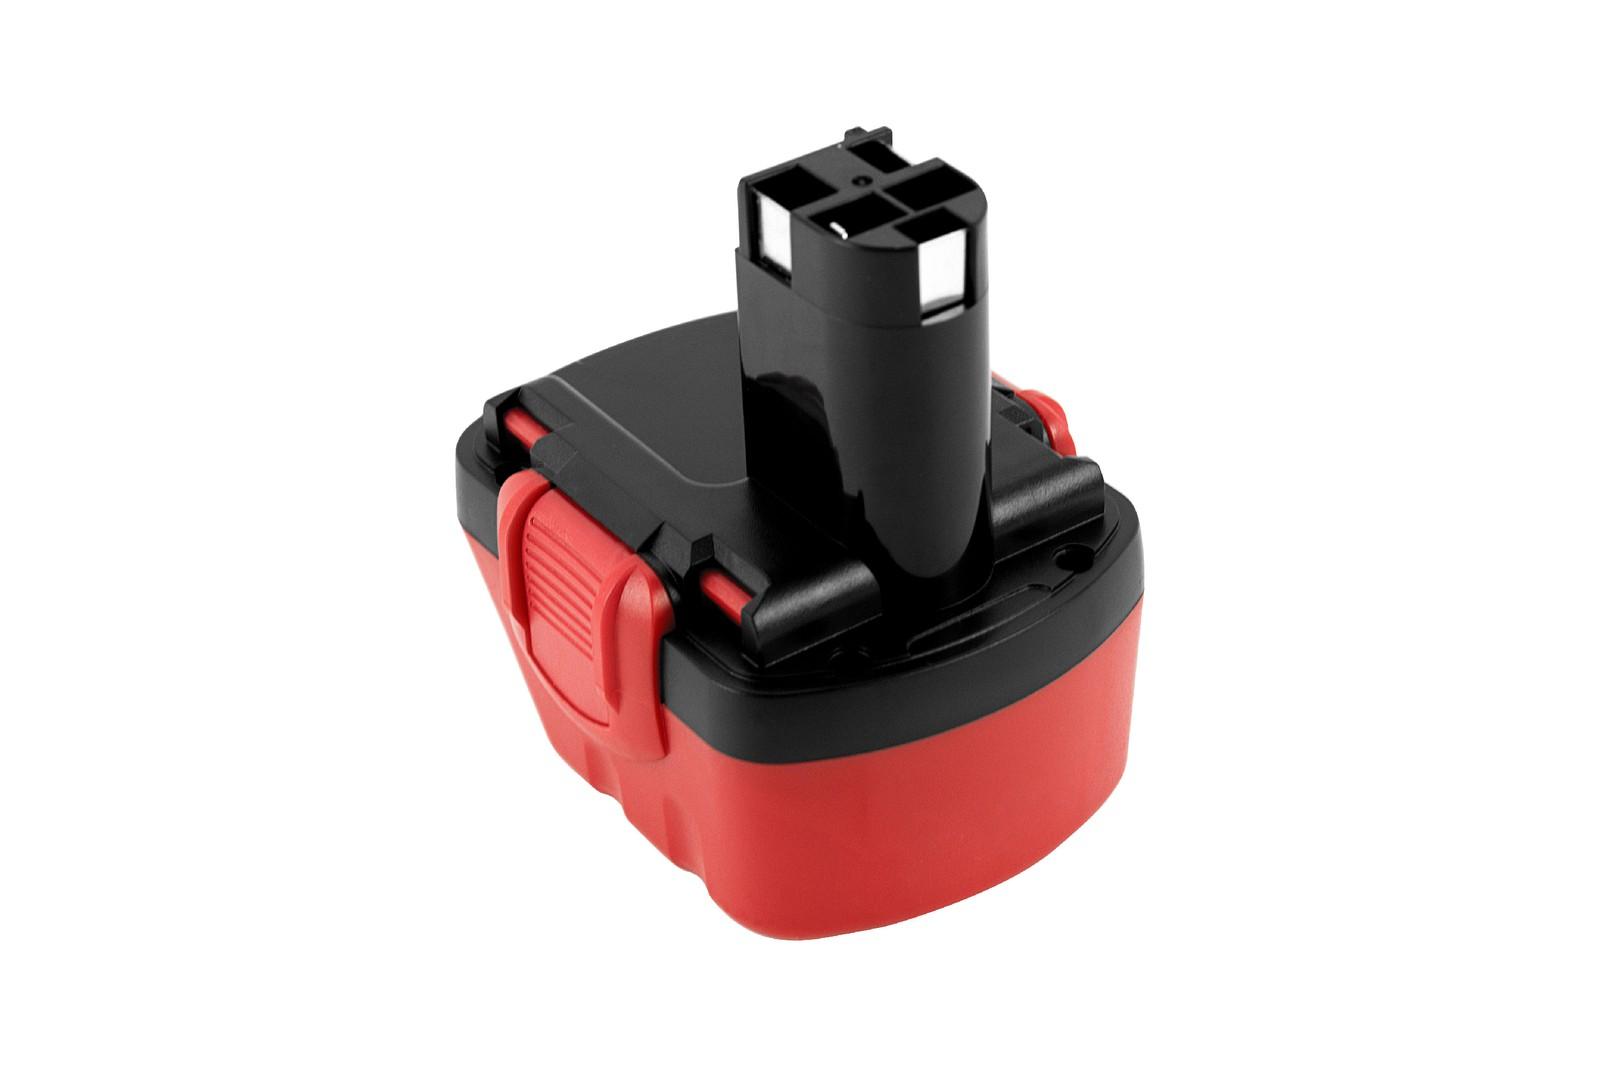 Akku für Elektrowerkzeug Bosch PSB12VE-2-2000mAh 12V Ni-Mh GARES Marke